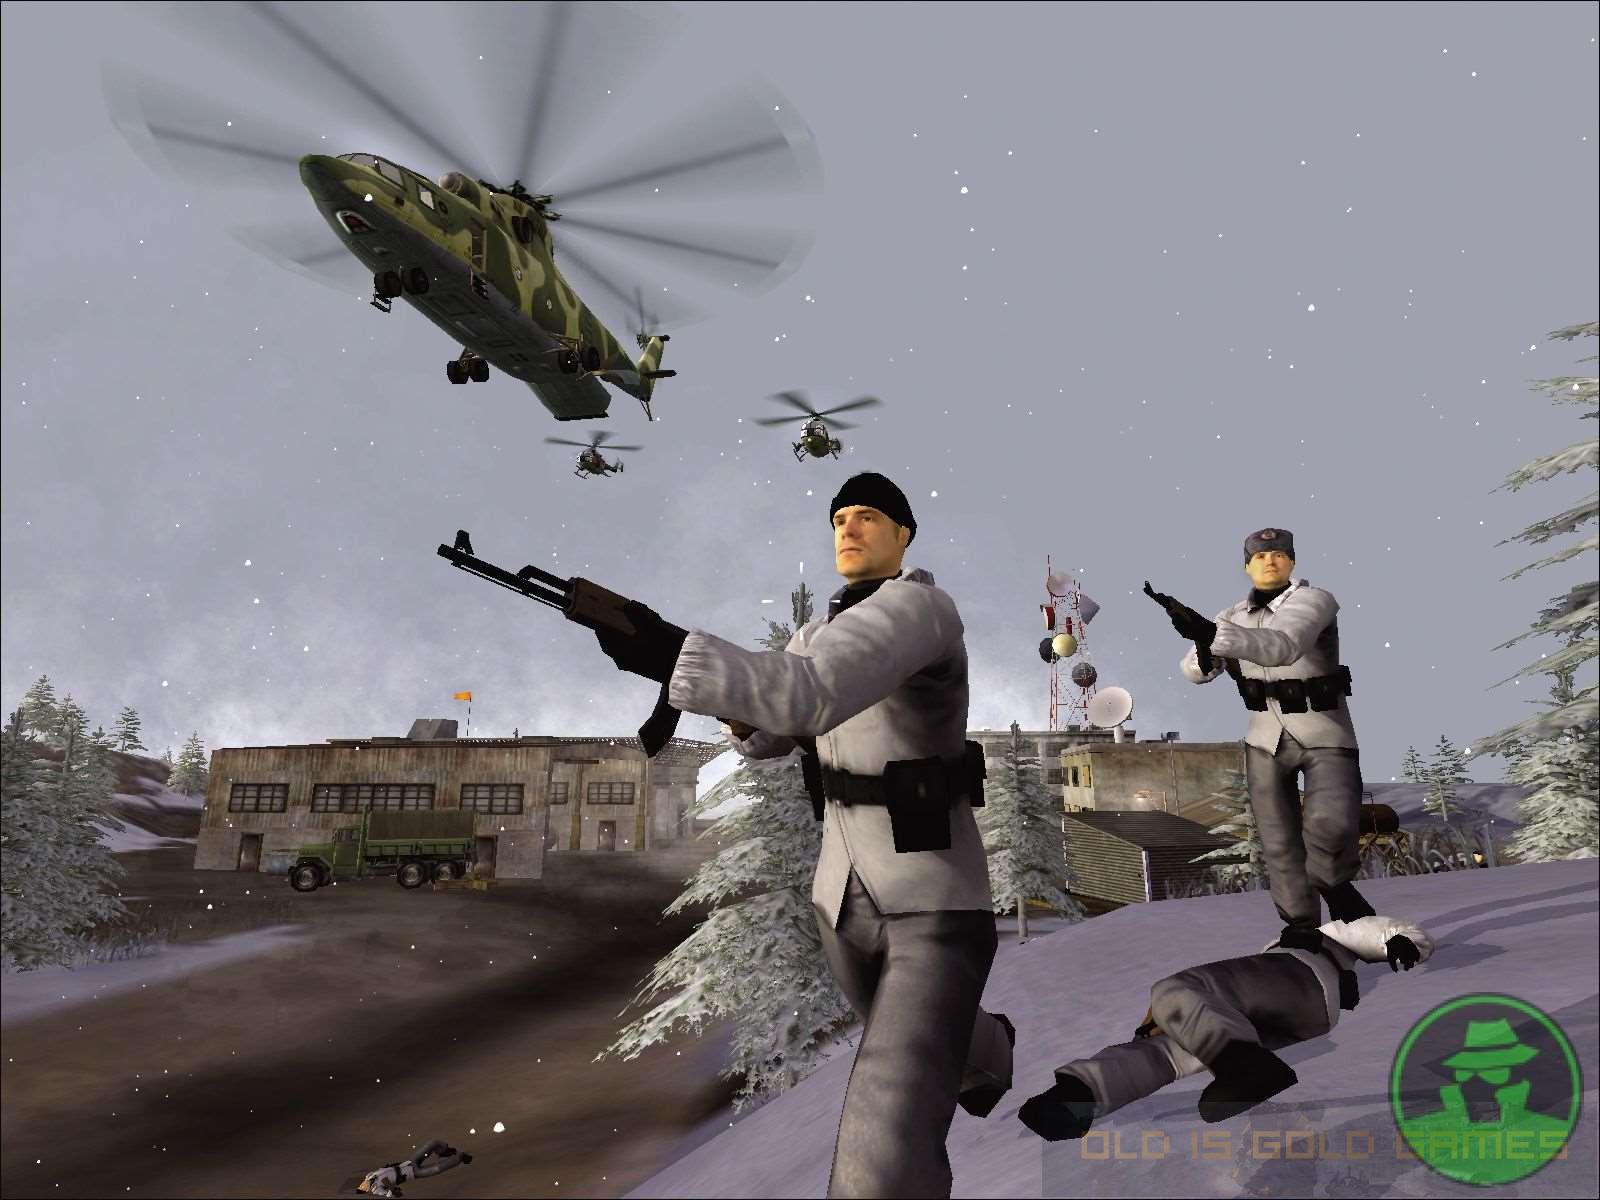 Delta Force Xtreme 2 Features